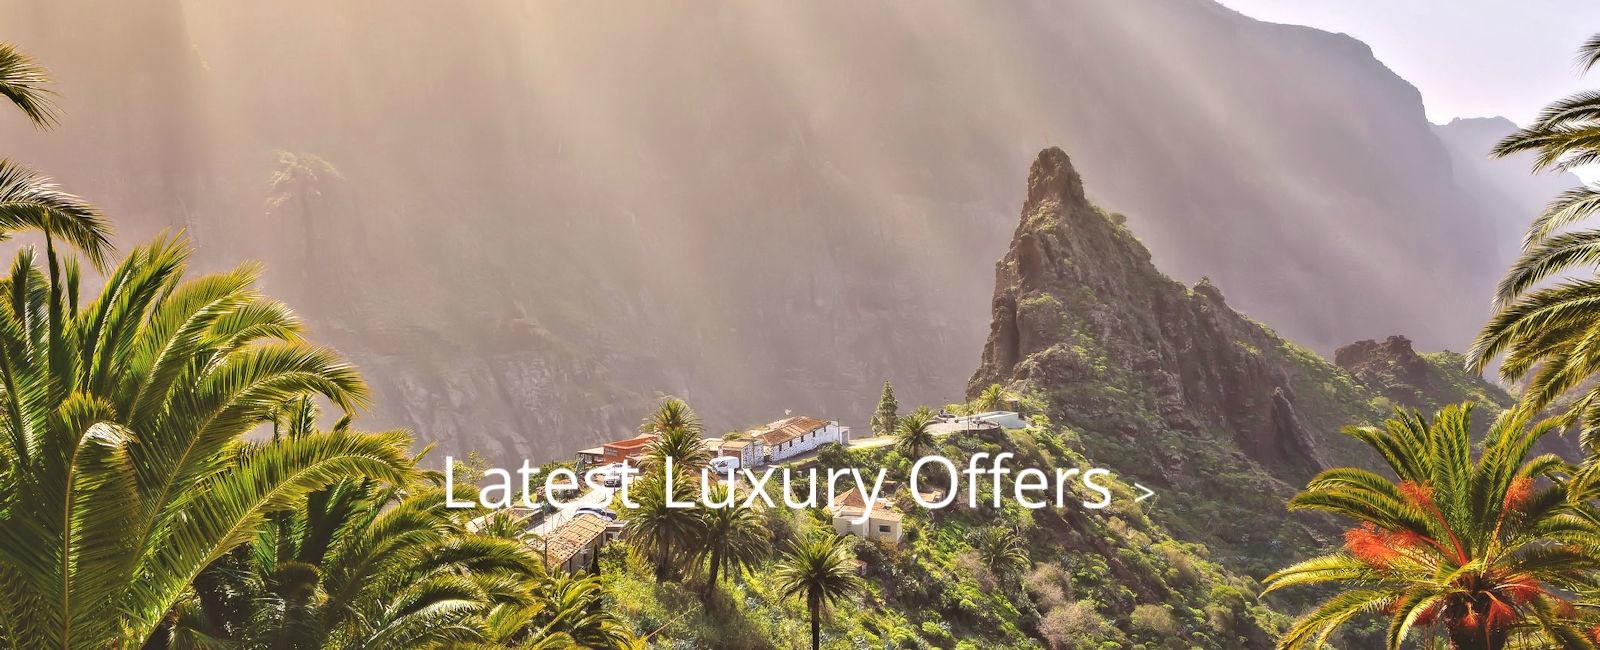 Luxur Offers